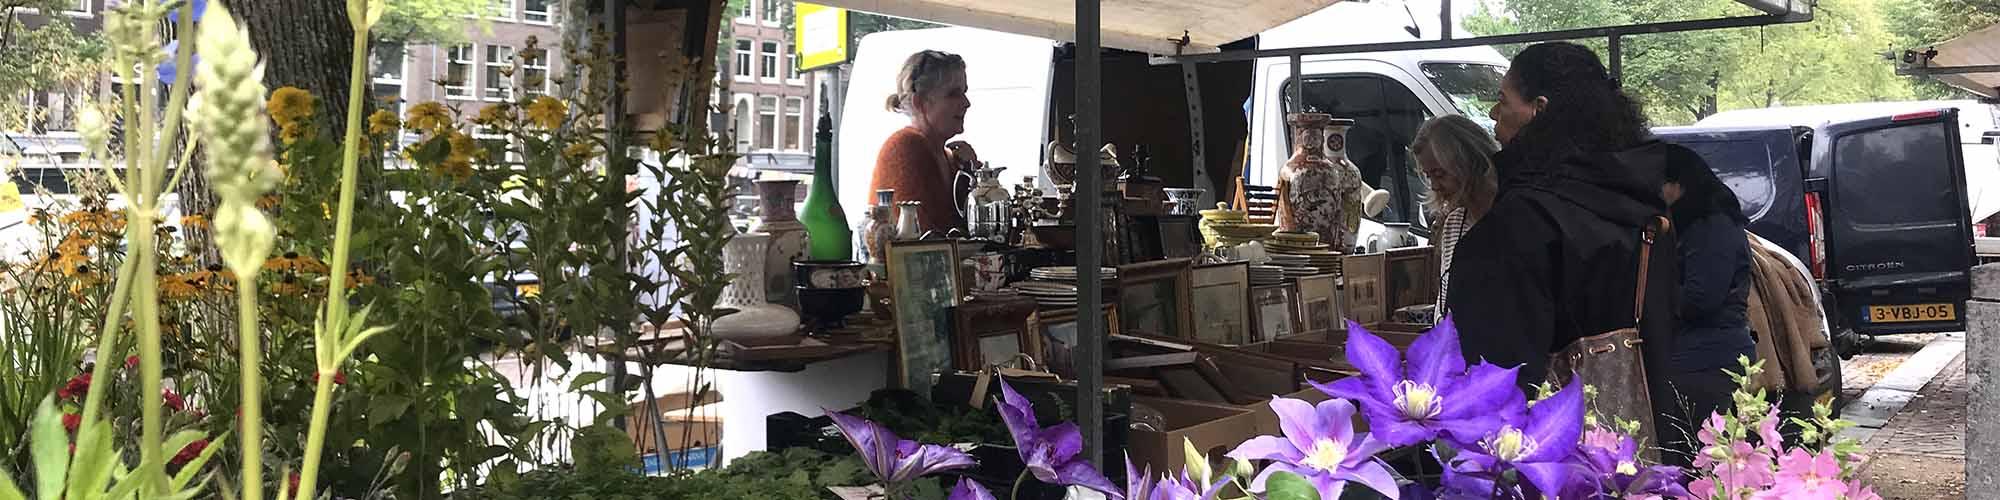 https://www.noordermarkt-amsterdam.nl/uploads/images/fotostroke/Contact-1.jpg